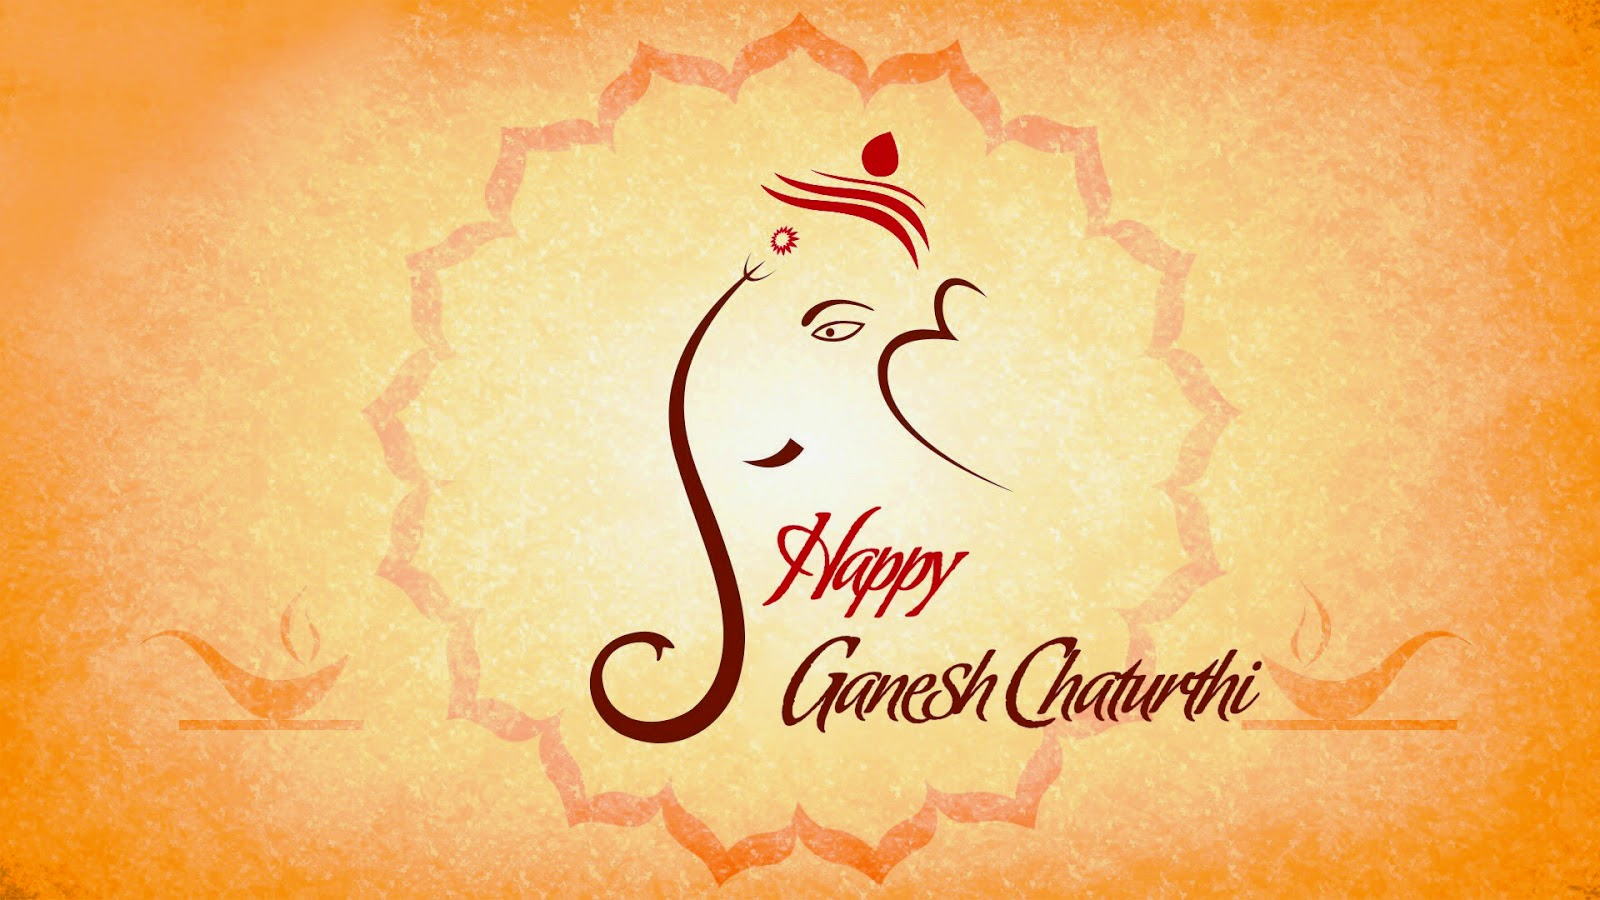 Happy Ganesh Chaturthi 2016 Wallpapers